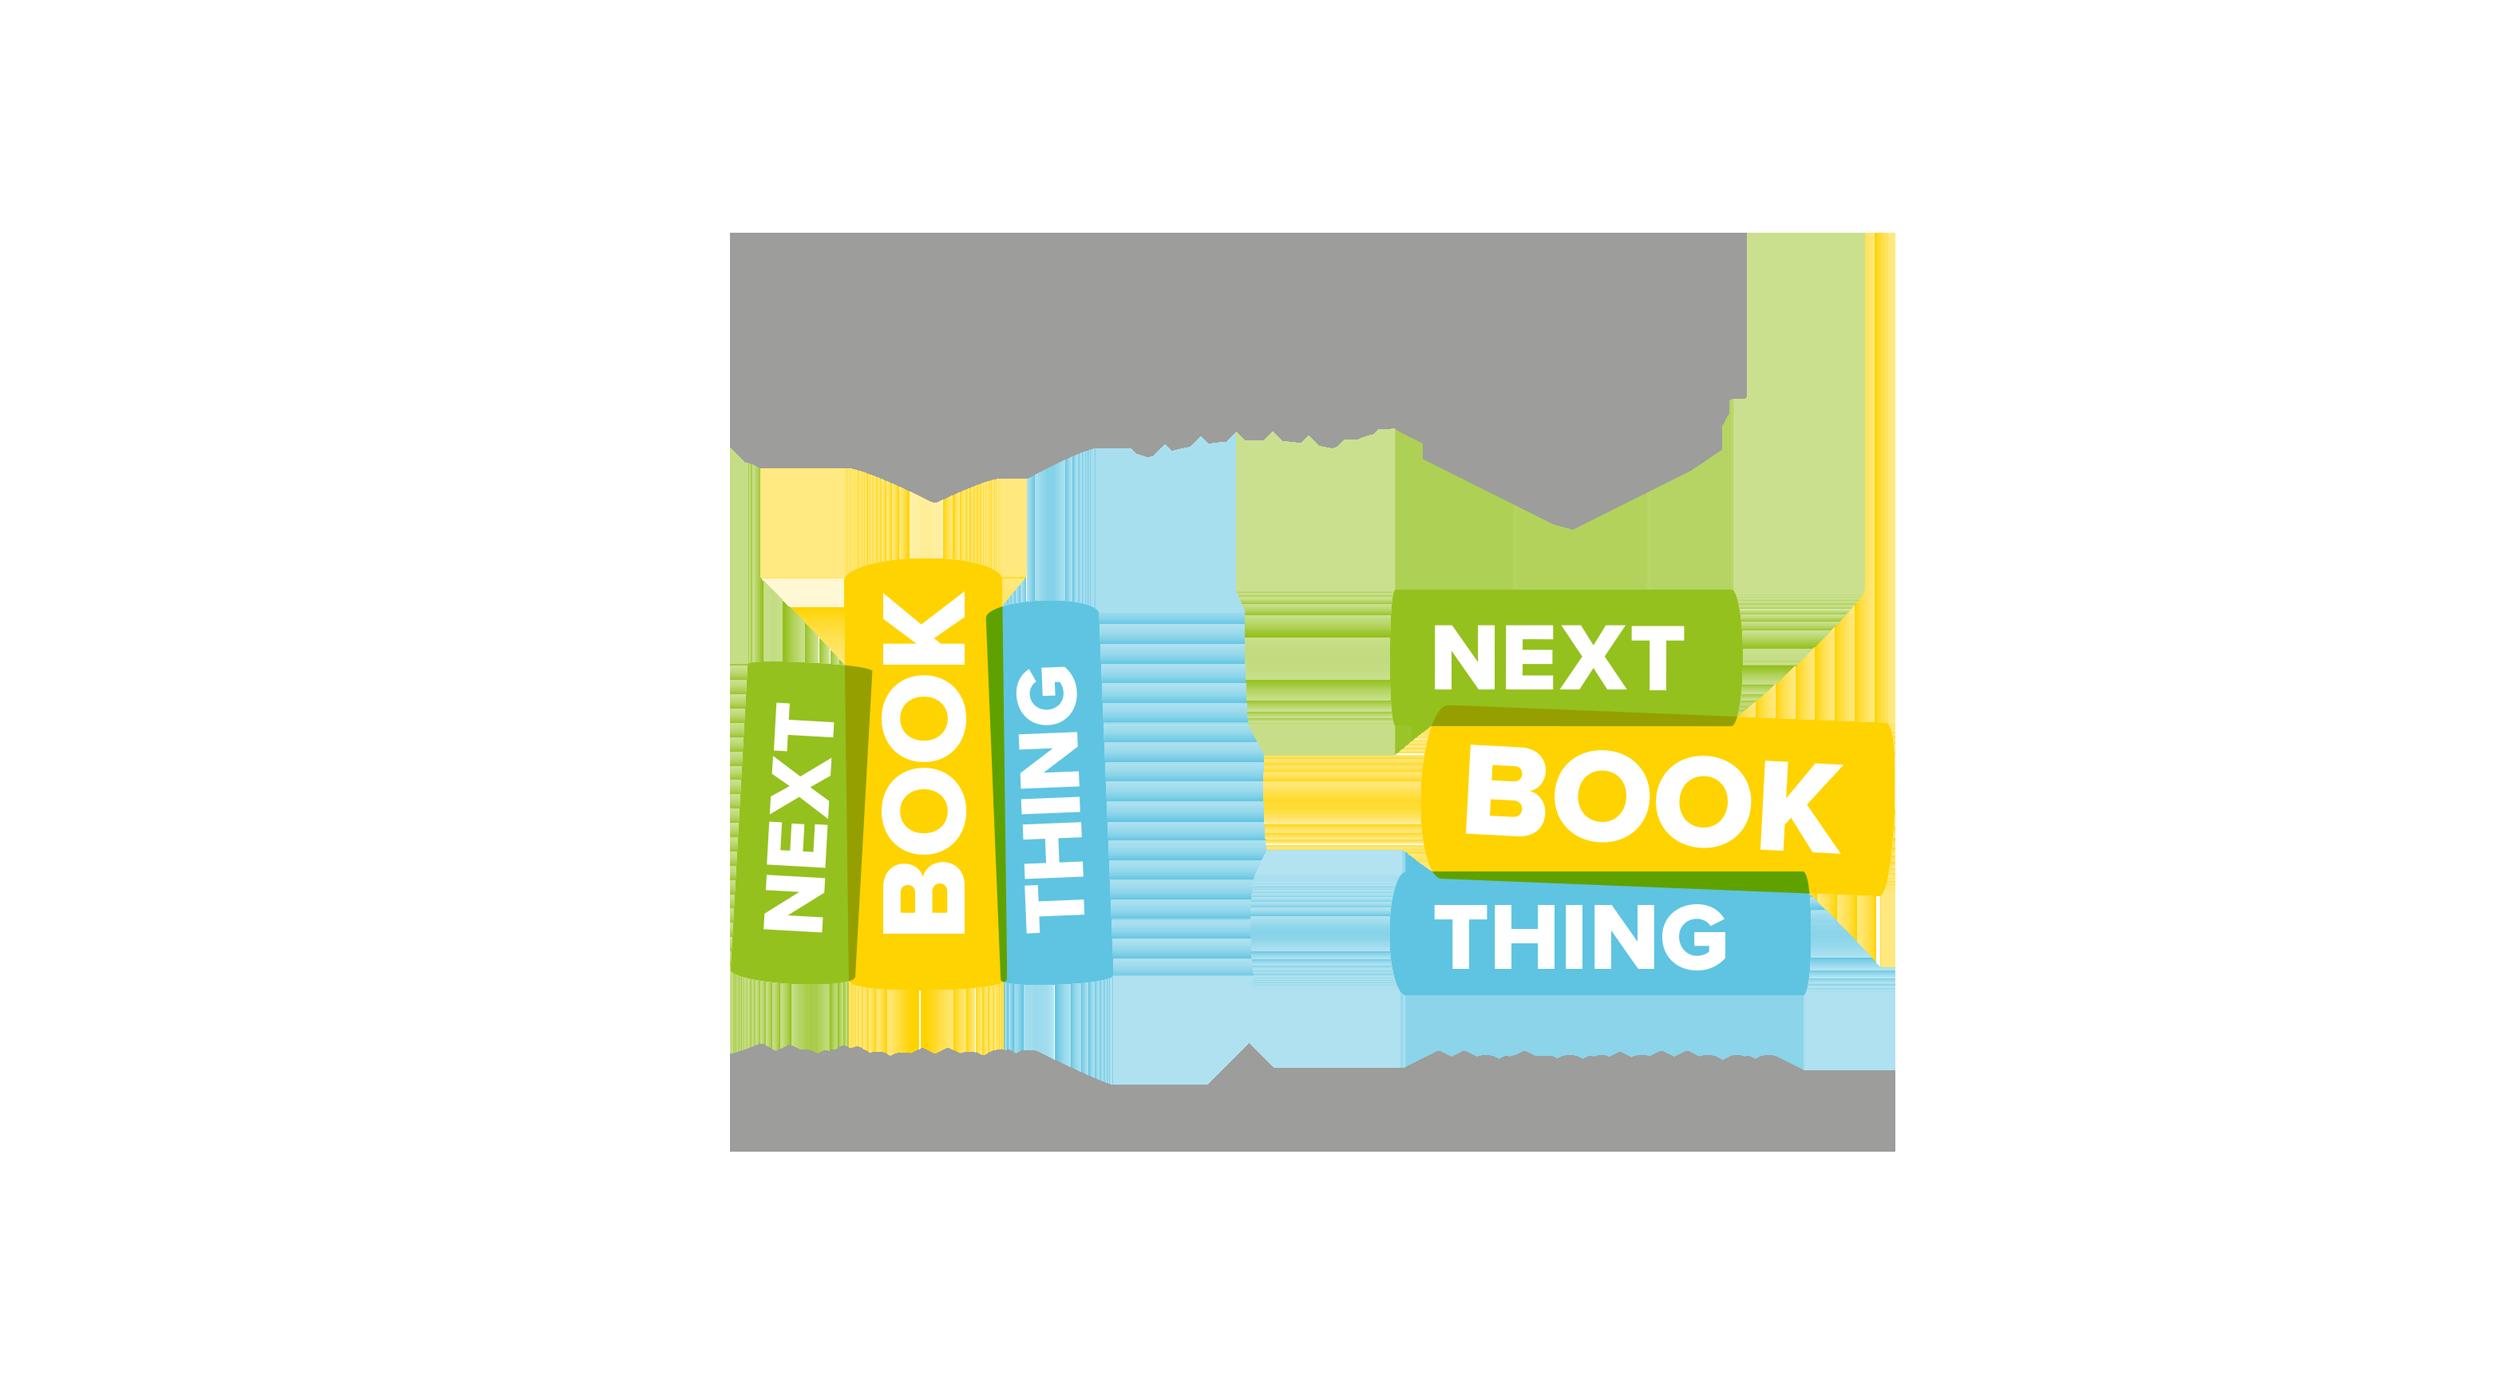 Vertical & horizontal logo